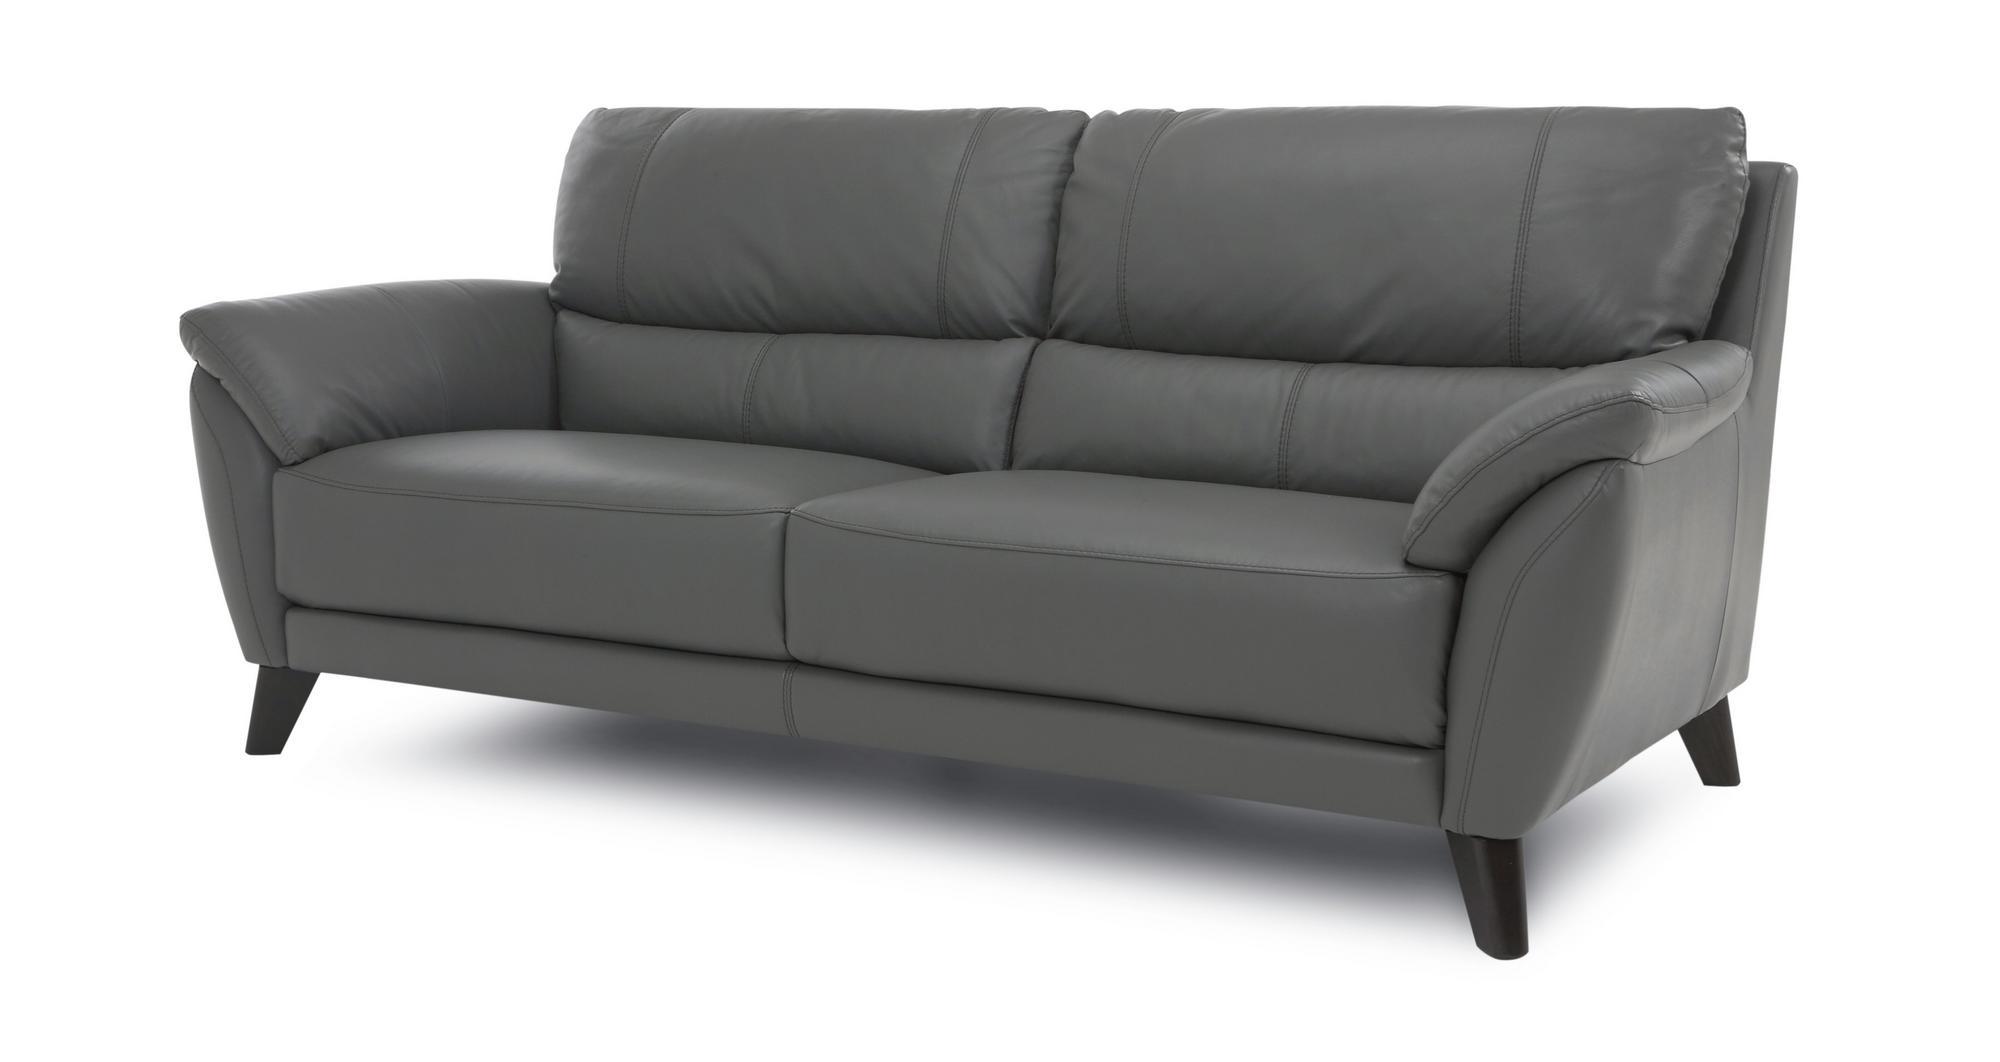 Dfs Graduate Graphite Grey Leather 3 Seater Sofa Stool